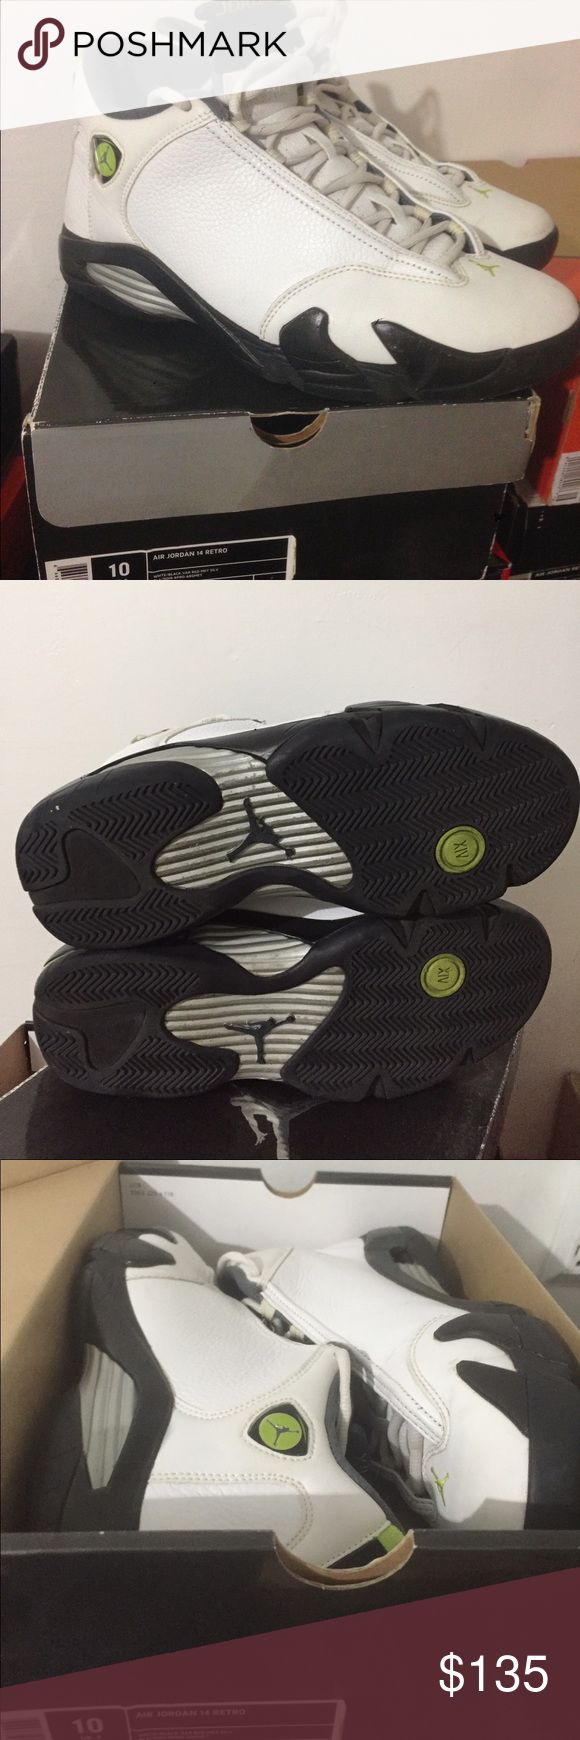 Nike Air Jordan XIV size 10 1000% authentic Jordan XIV shoes white chartreuse size 10 Nike Shoes Athletic Shoes